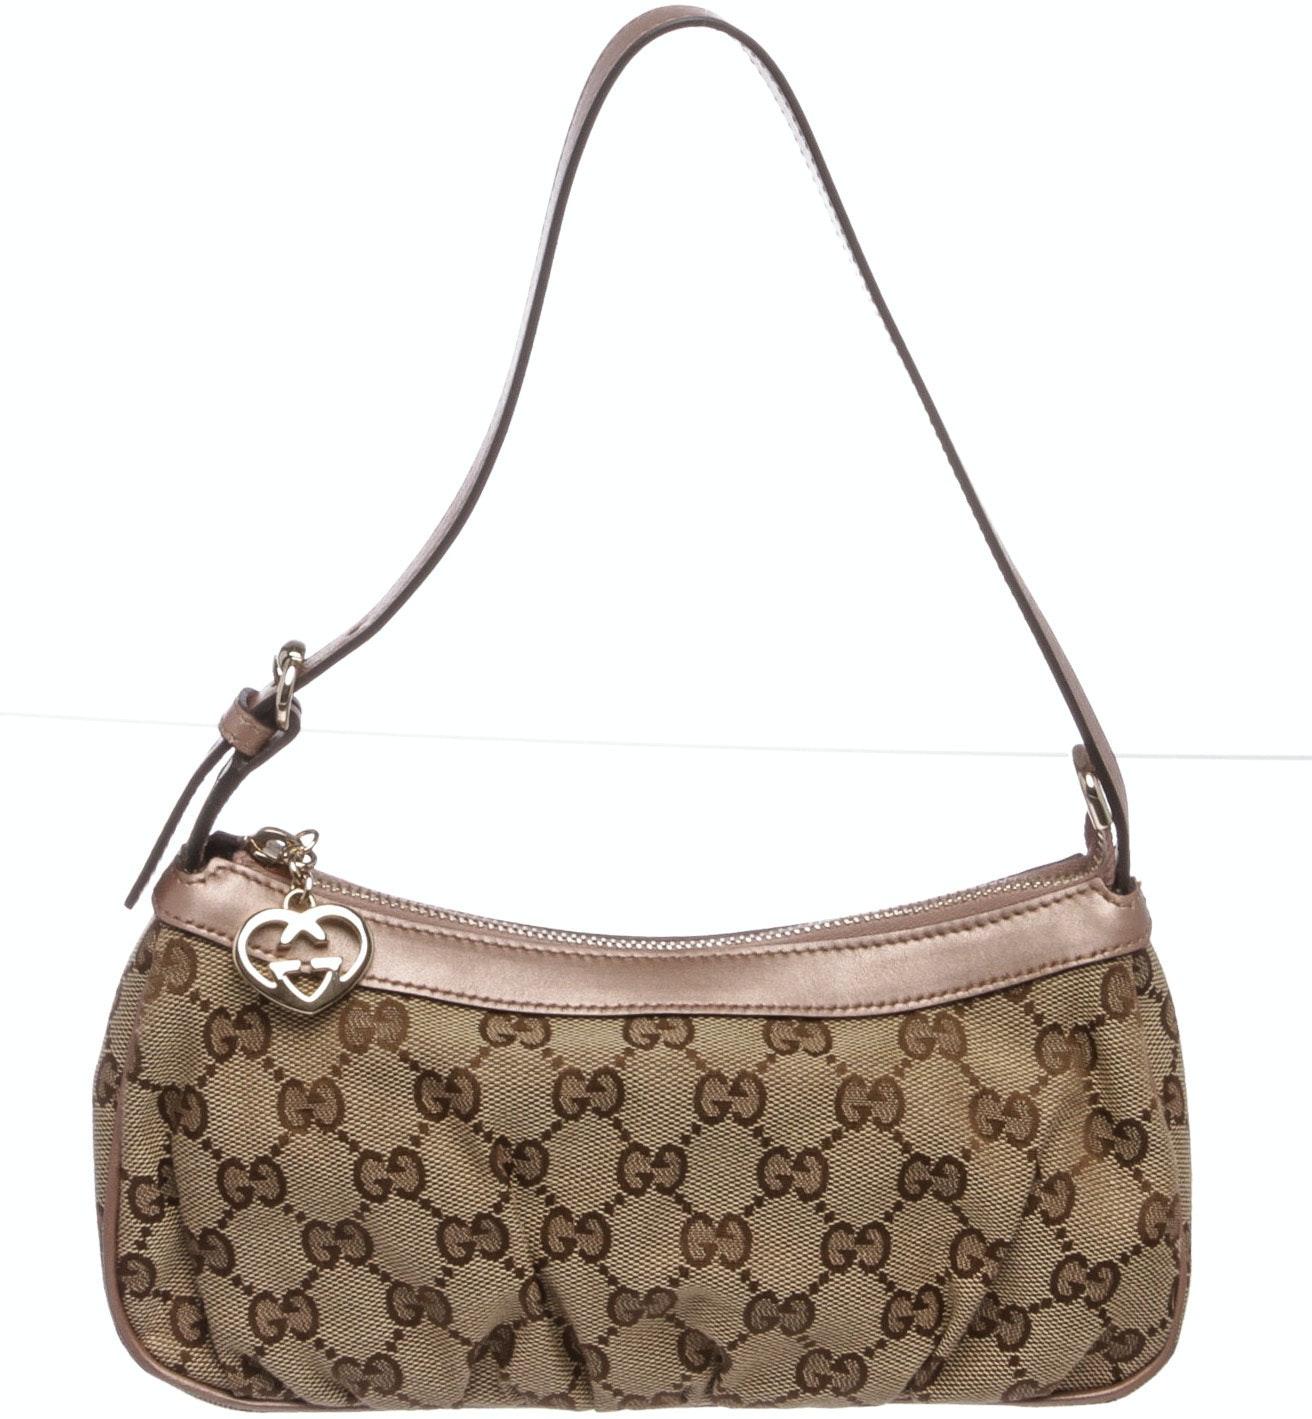 Gucci Interlock G Heart Top Handle Monogram GG Light Pink Leather Trim Beige